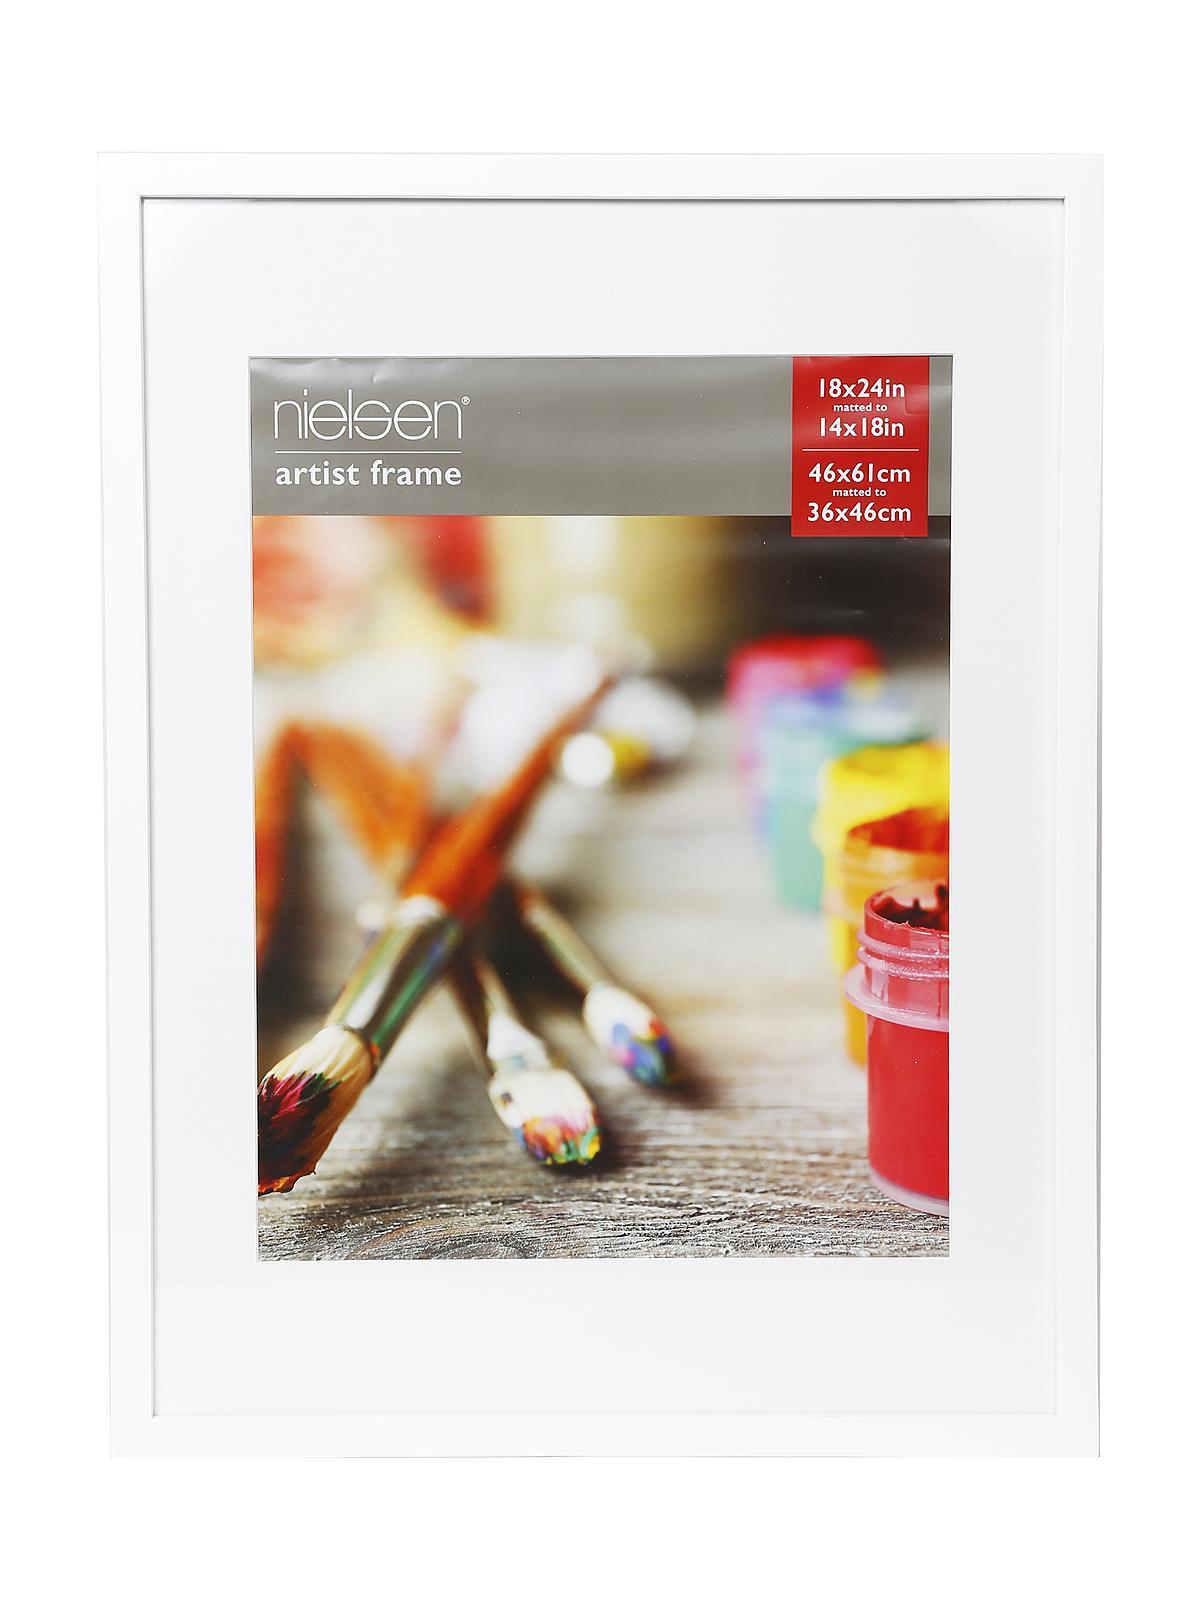 Nielsen Bainbridge Gallery Wood Frames for Canvas | MisterArt.com